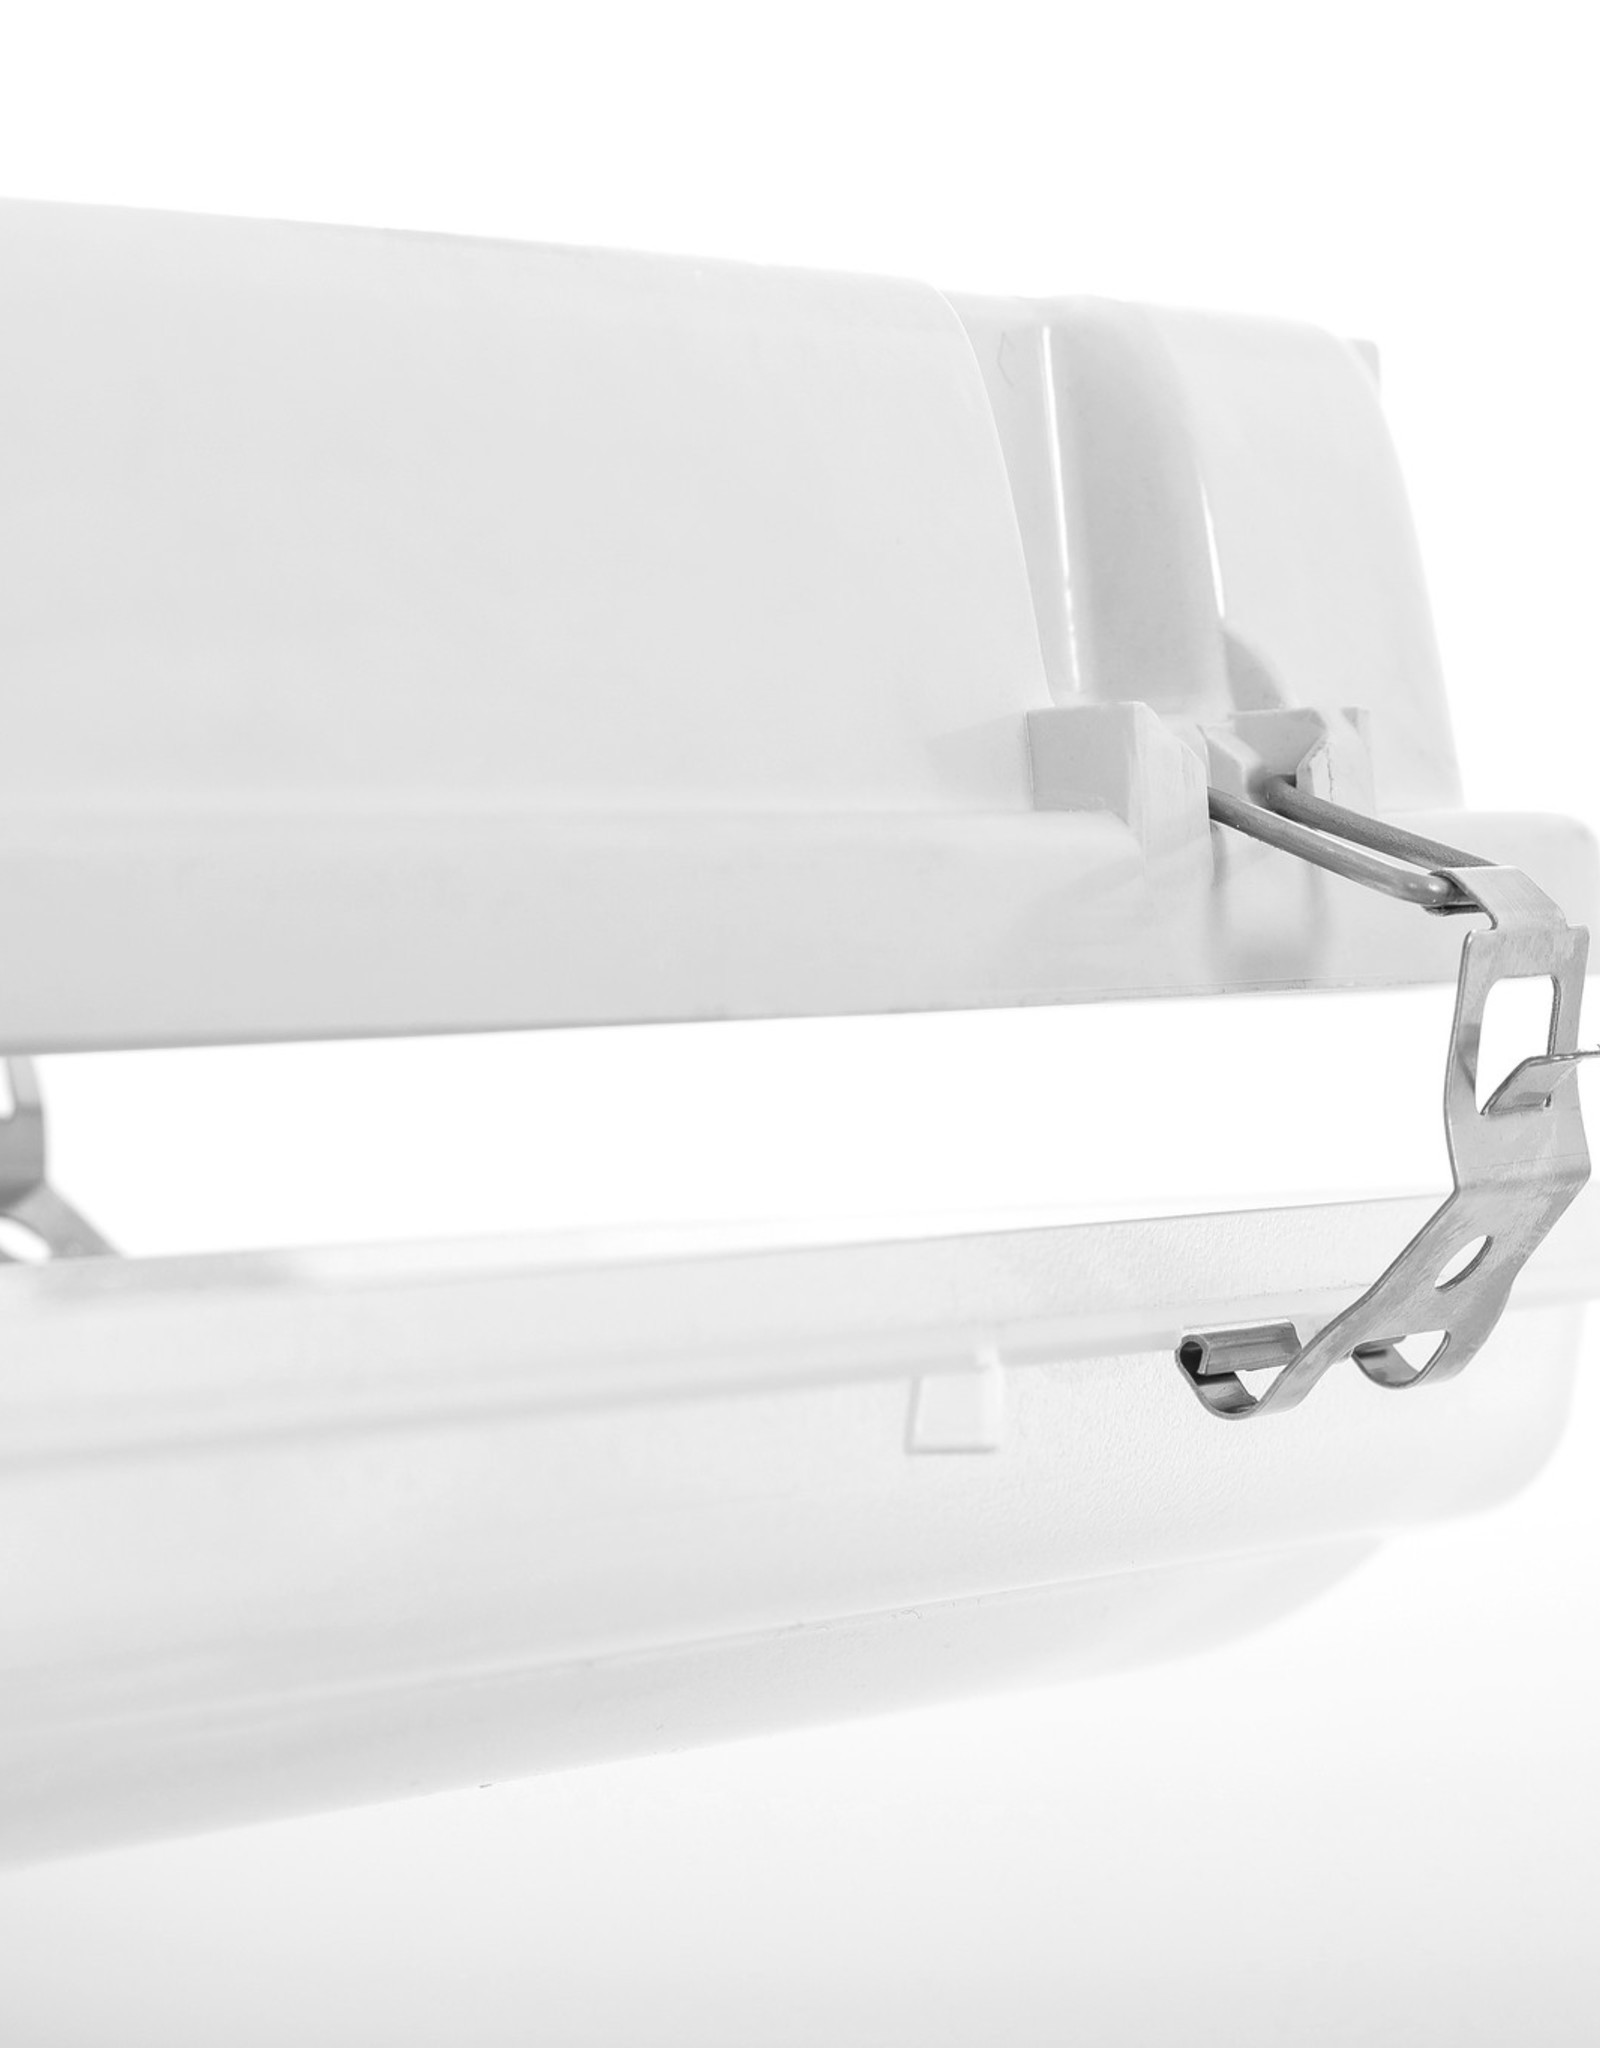 LUXON LED INDUSTRIAL: LED 5.0 BASIC Max